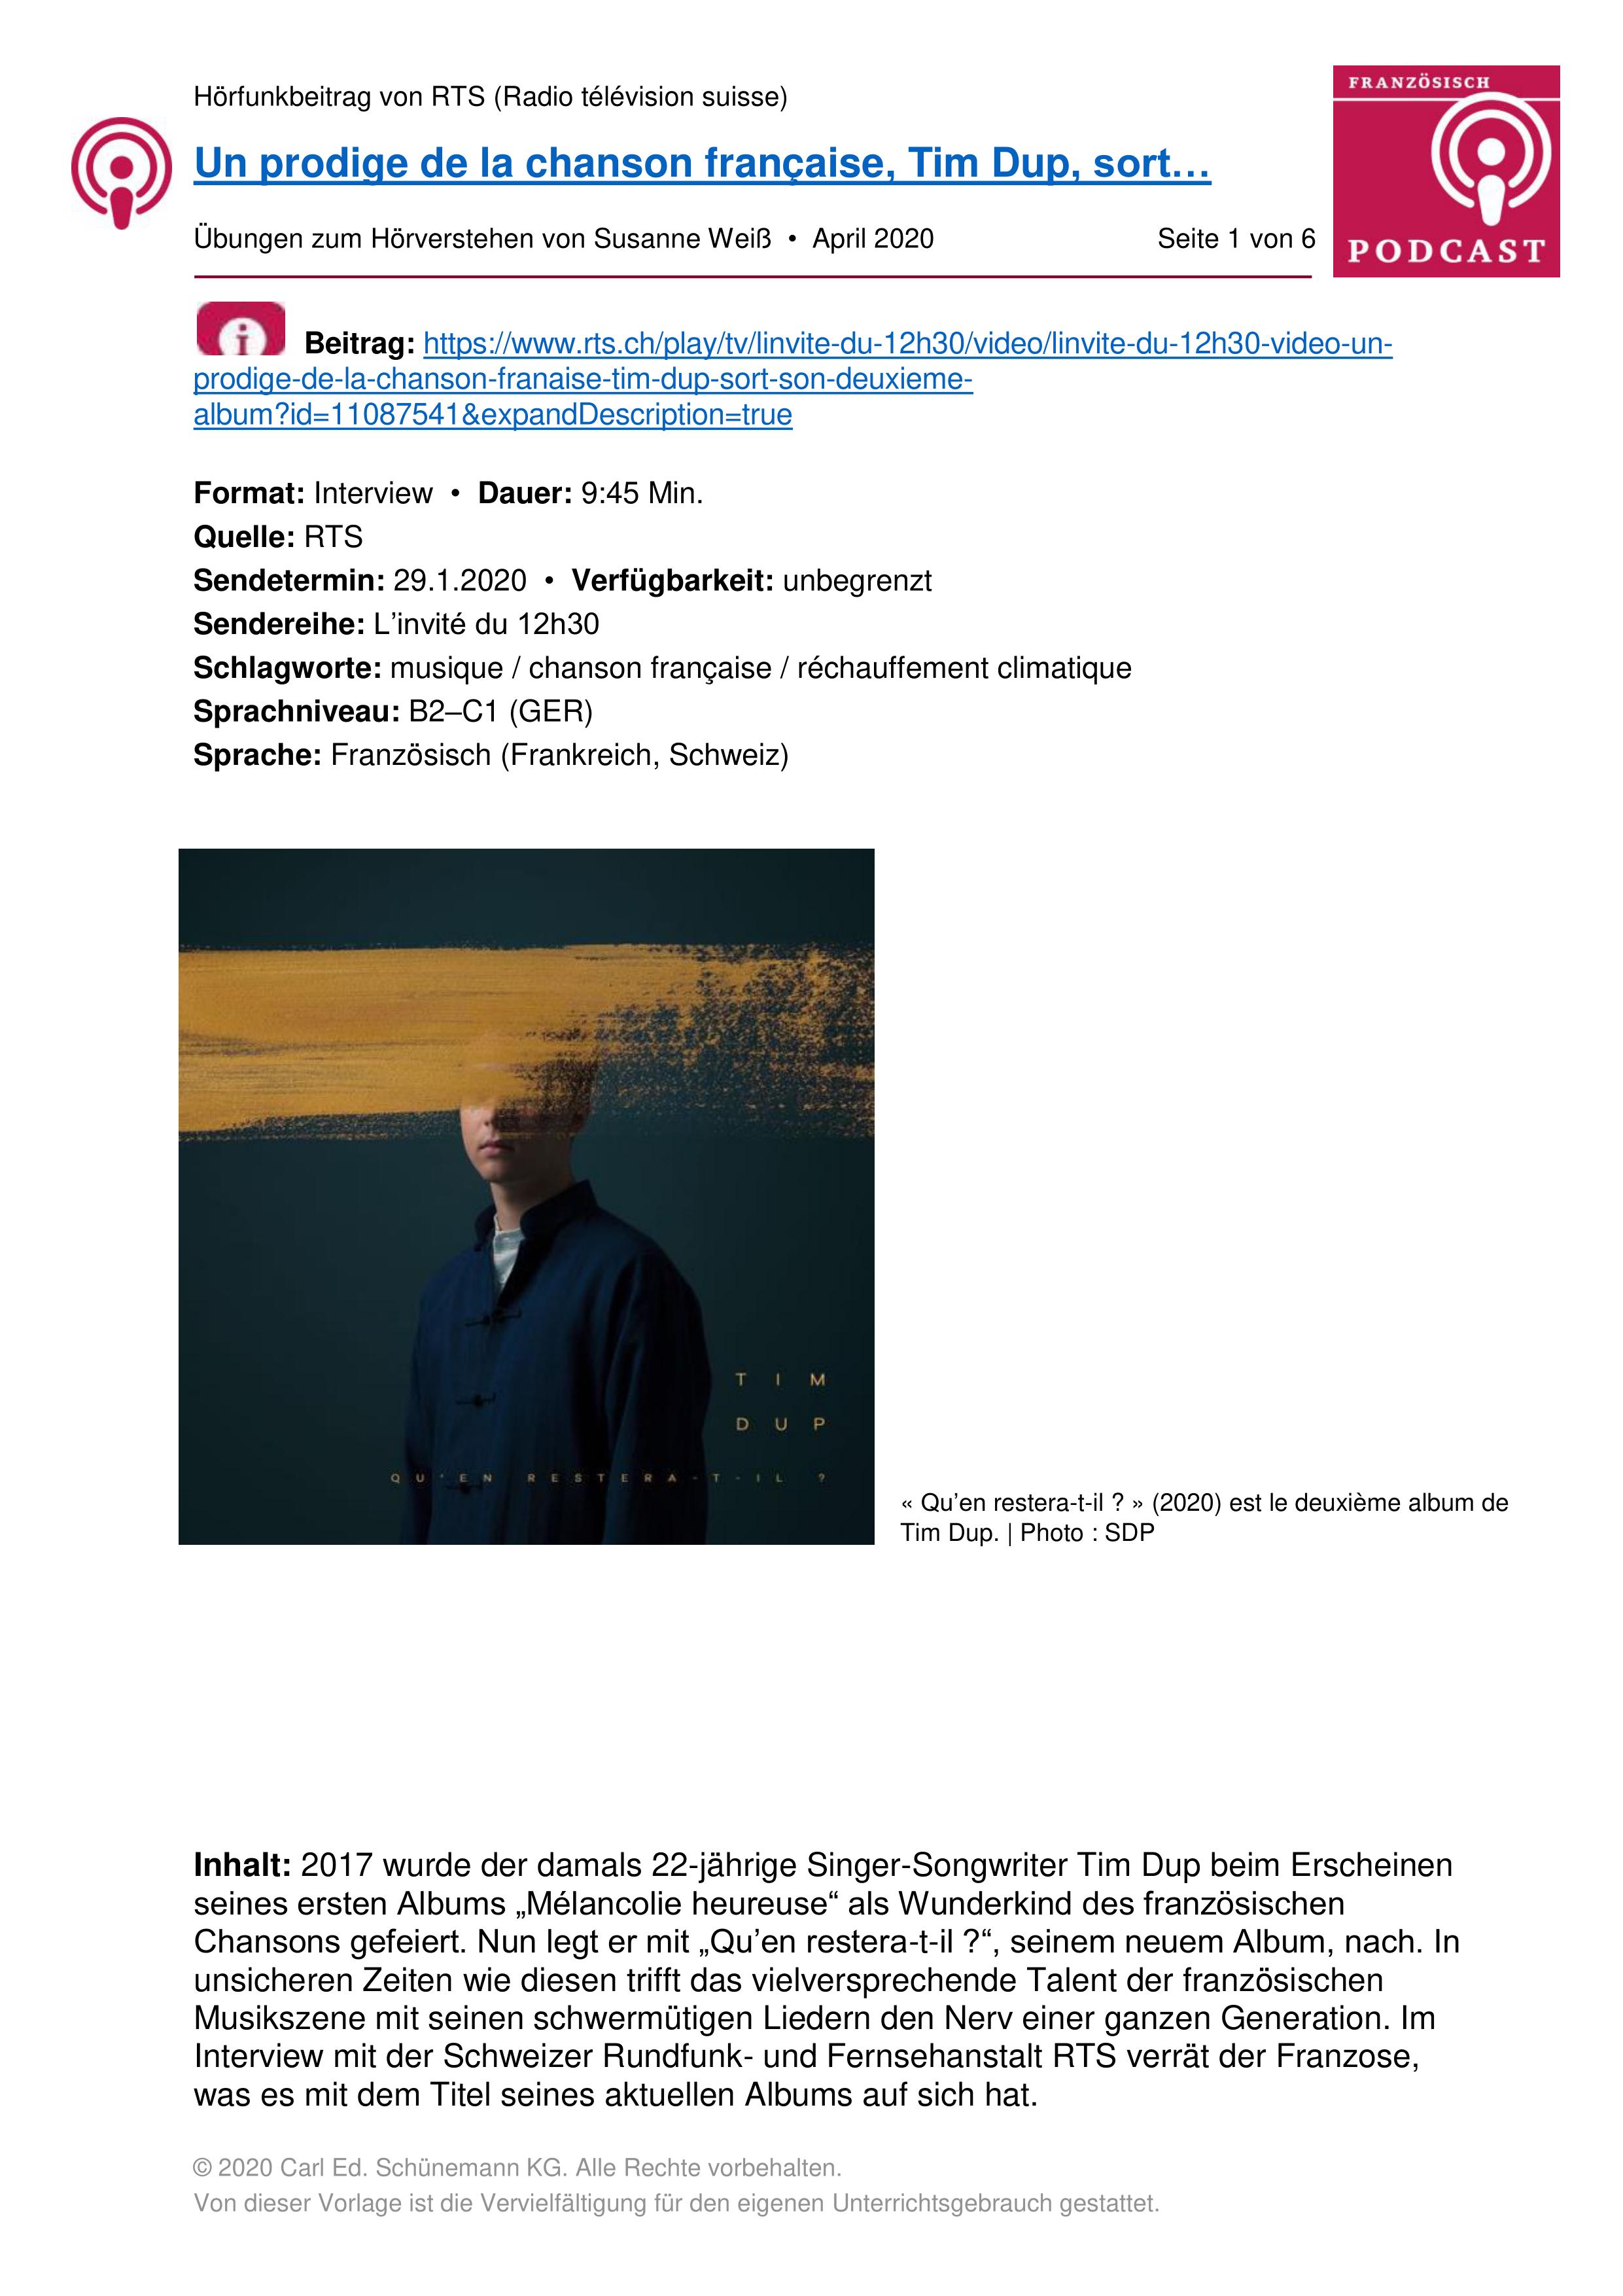 Ubungsmaterial Zu Podcast Un Prodige De La Chanson Francaise Tim Dup Sort Son Deuxieme Album Unterrichtsmaterial Im Fach Franzosisch Podcast Singer Songwriter Rundfunk